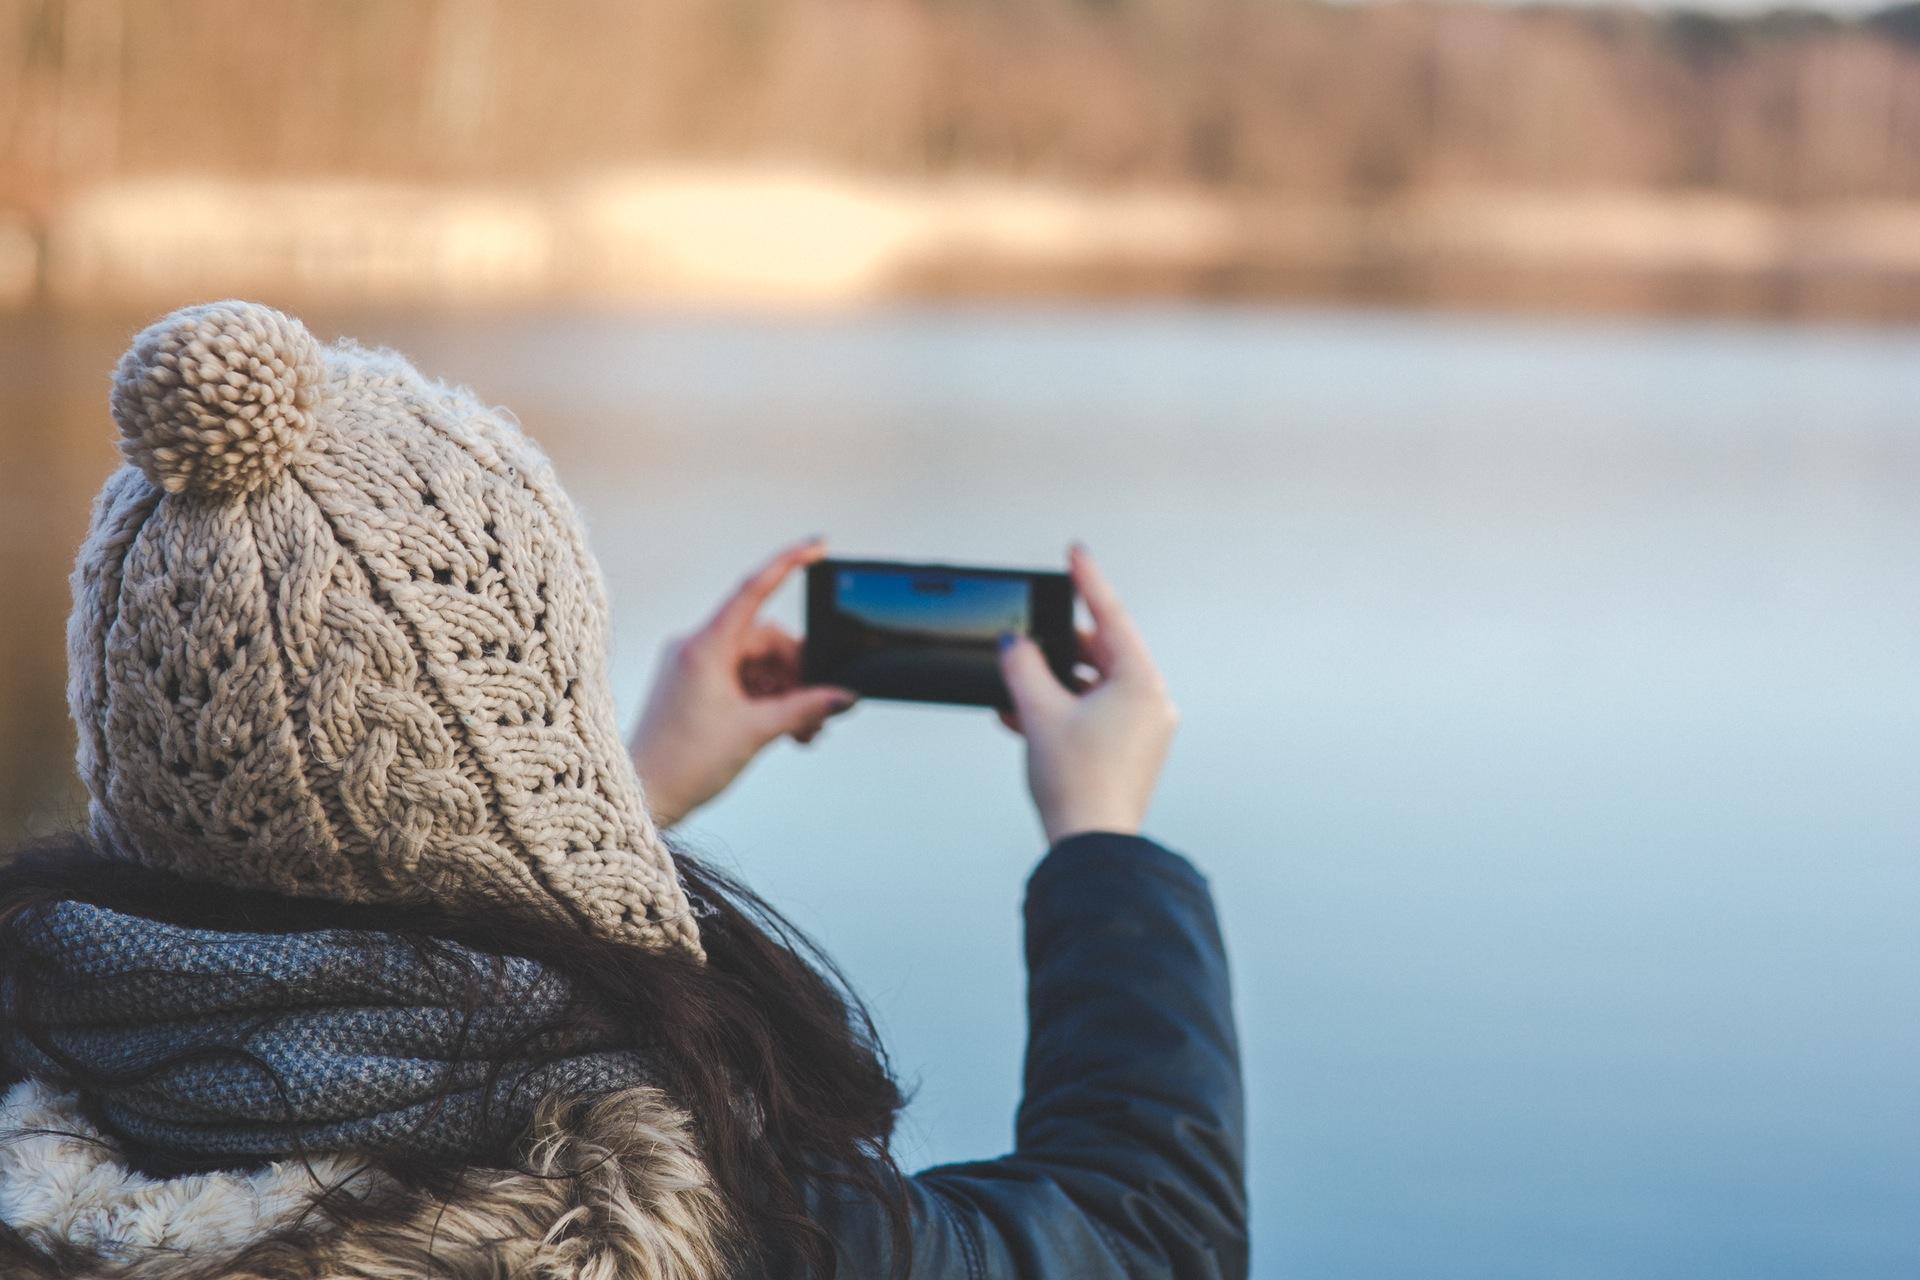 hands-woman-camera-smartphone